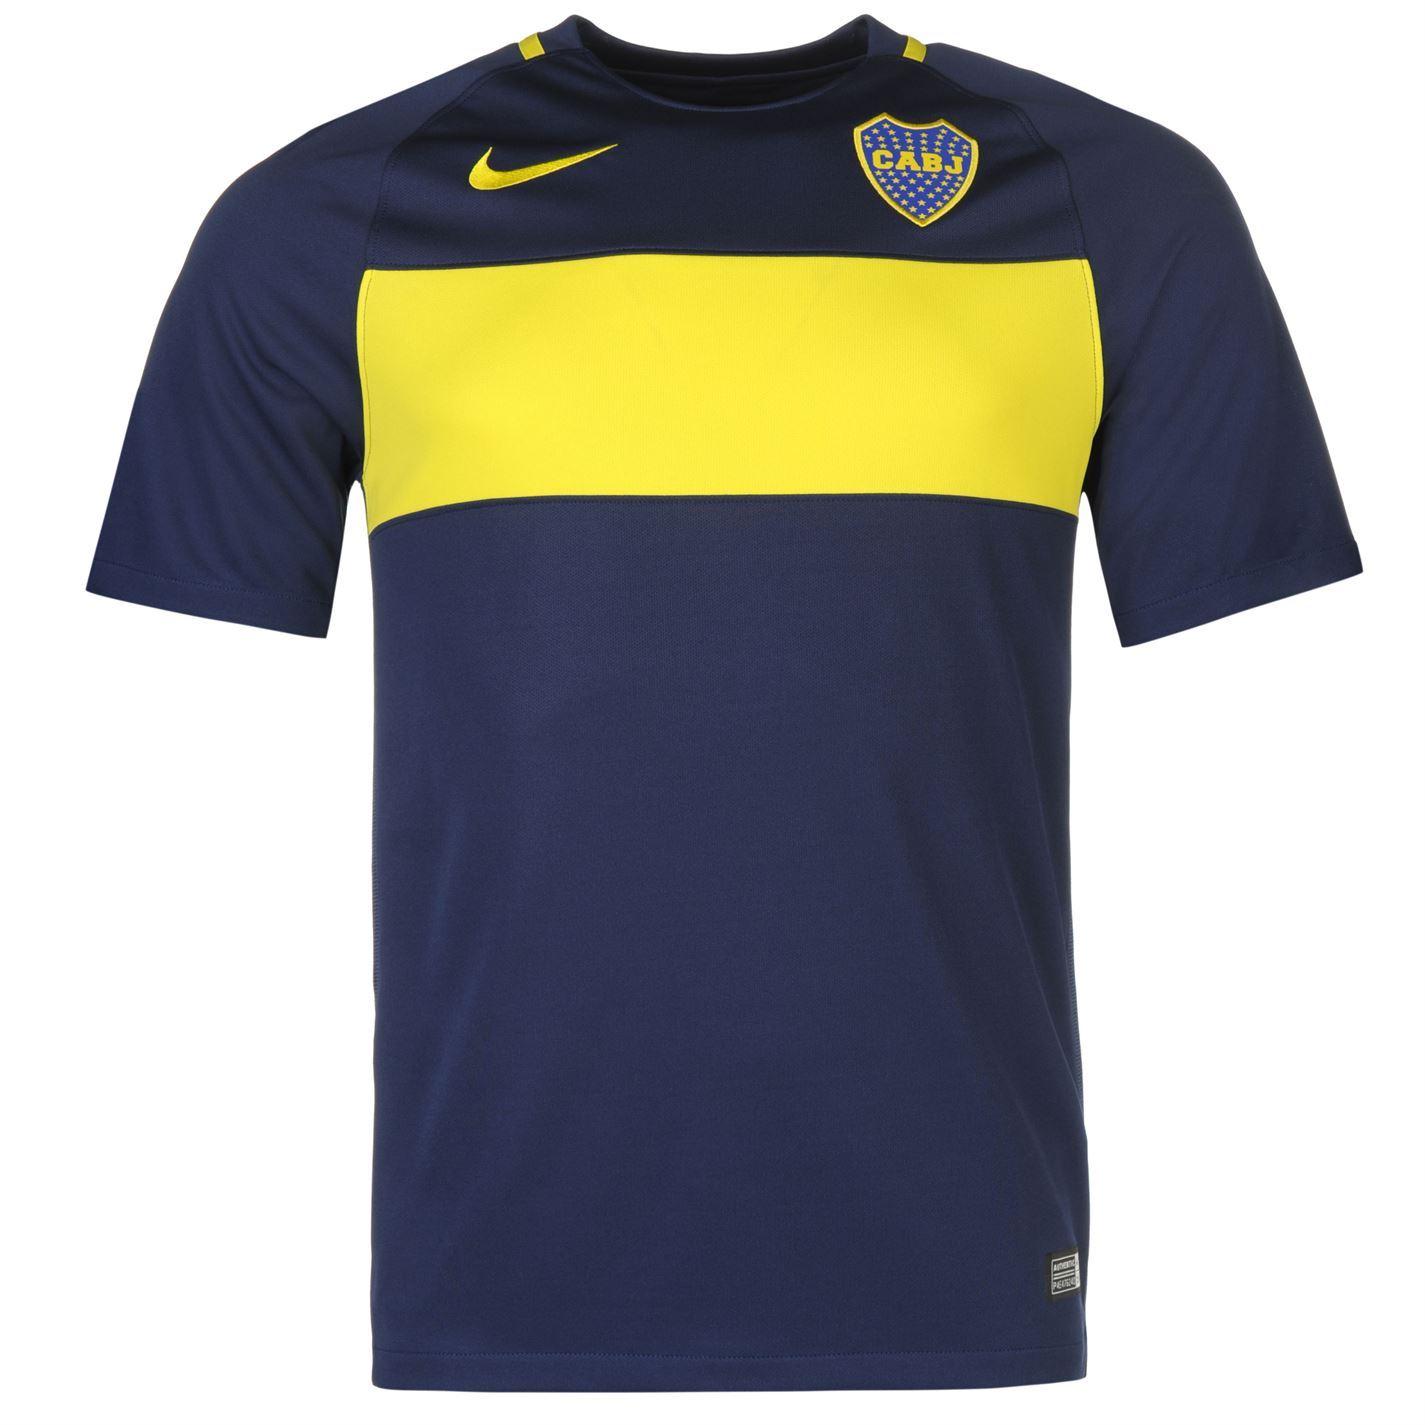 NIKE Boca Juniors Home Jersey 2016 2017 Mens Navy Football ...